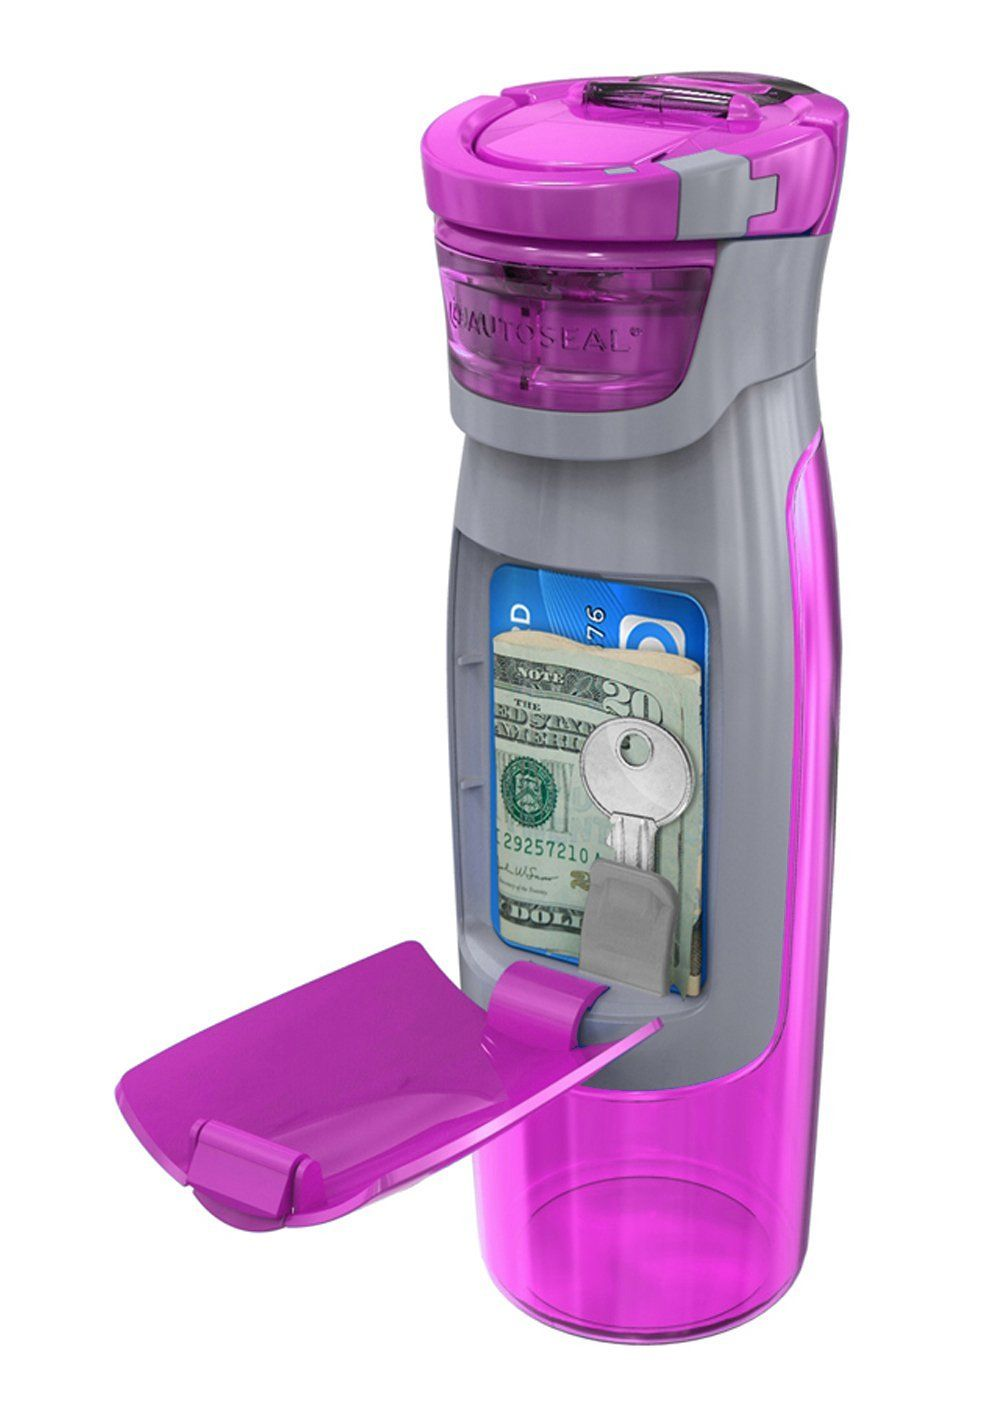 Contigo 24 oz Autoseal Kangaroo Water Bottle with Storage Compartment